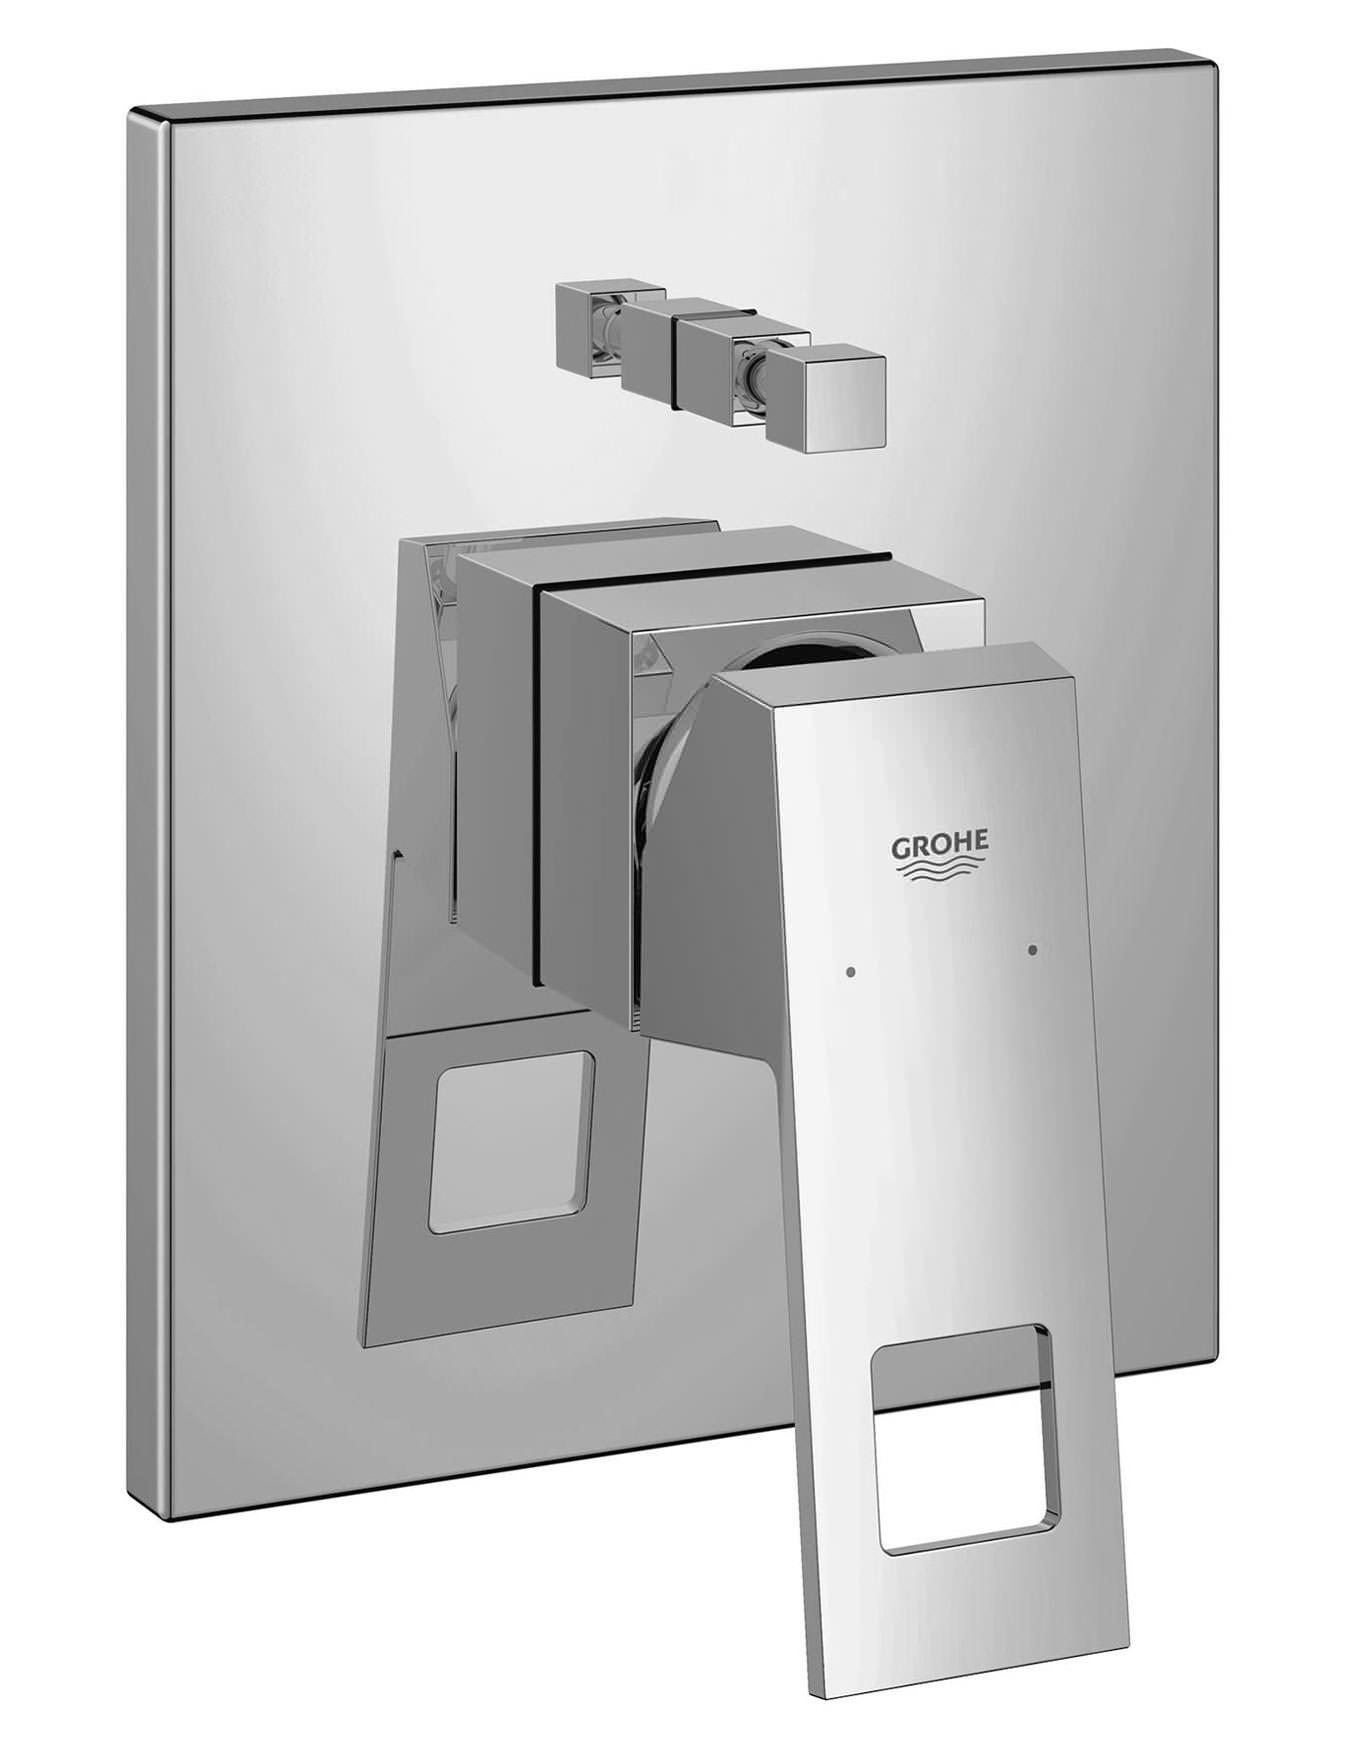 grohe eurocube chrome single lever bath mixer trim. Black Bedroom Furniture Sets. Home Design Ideas